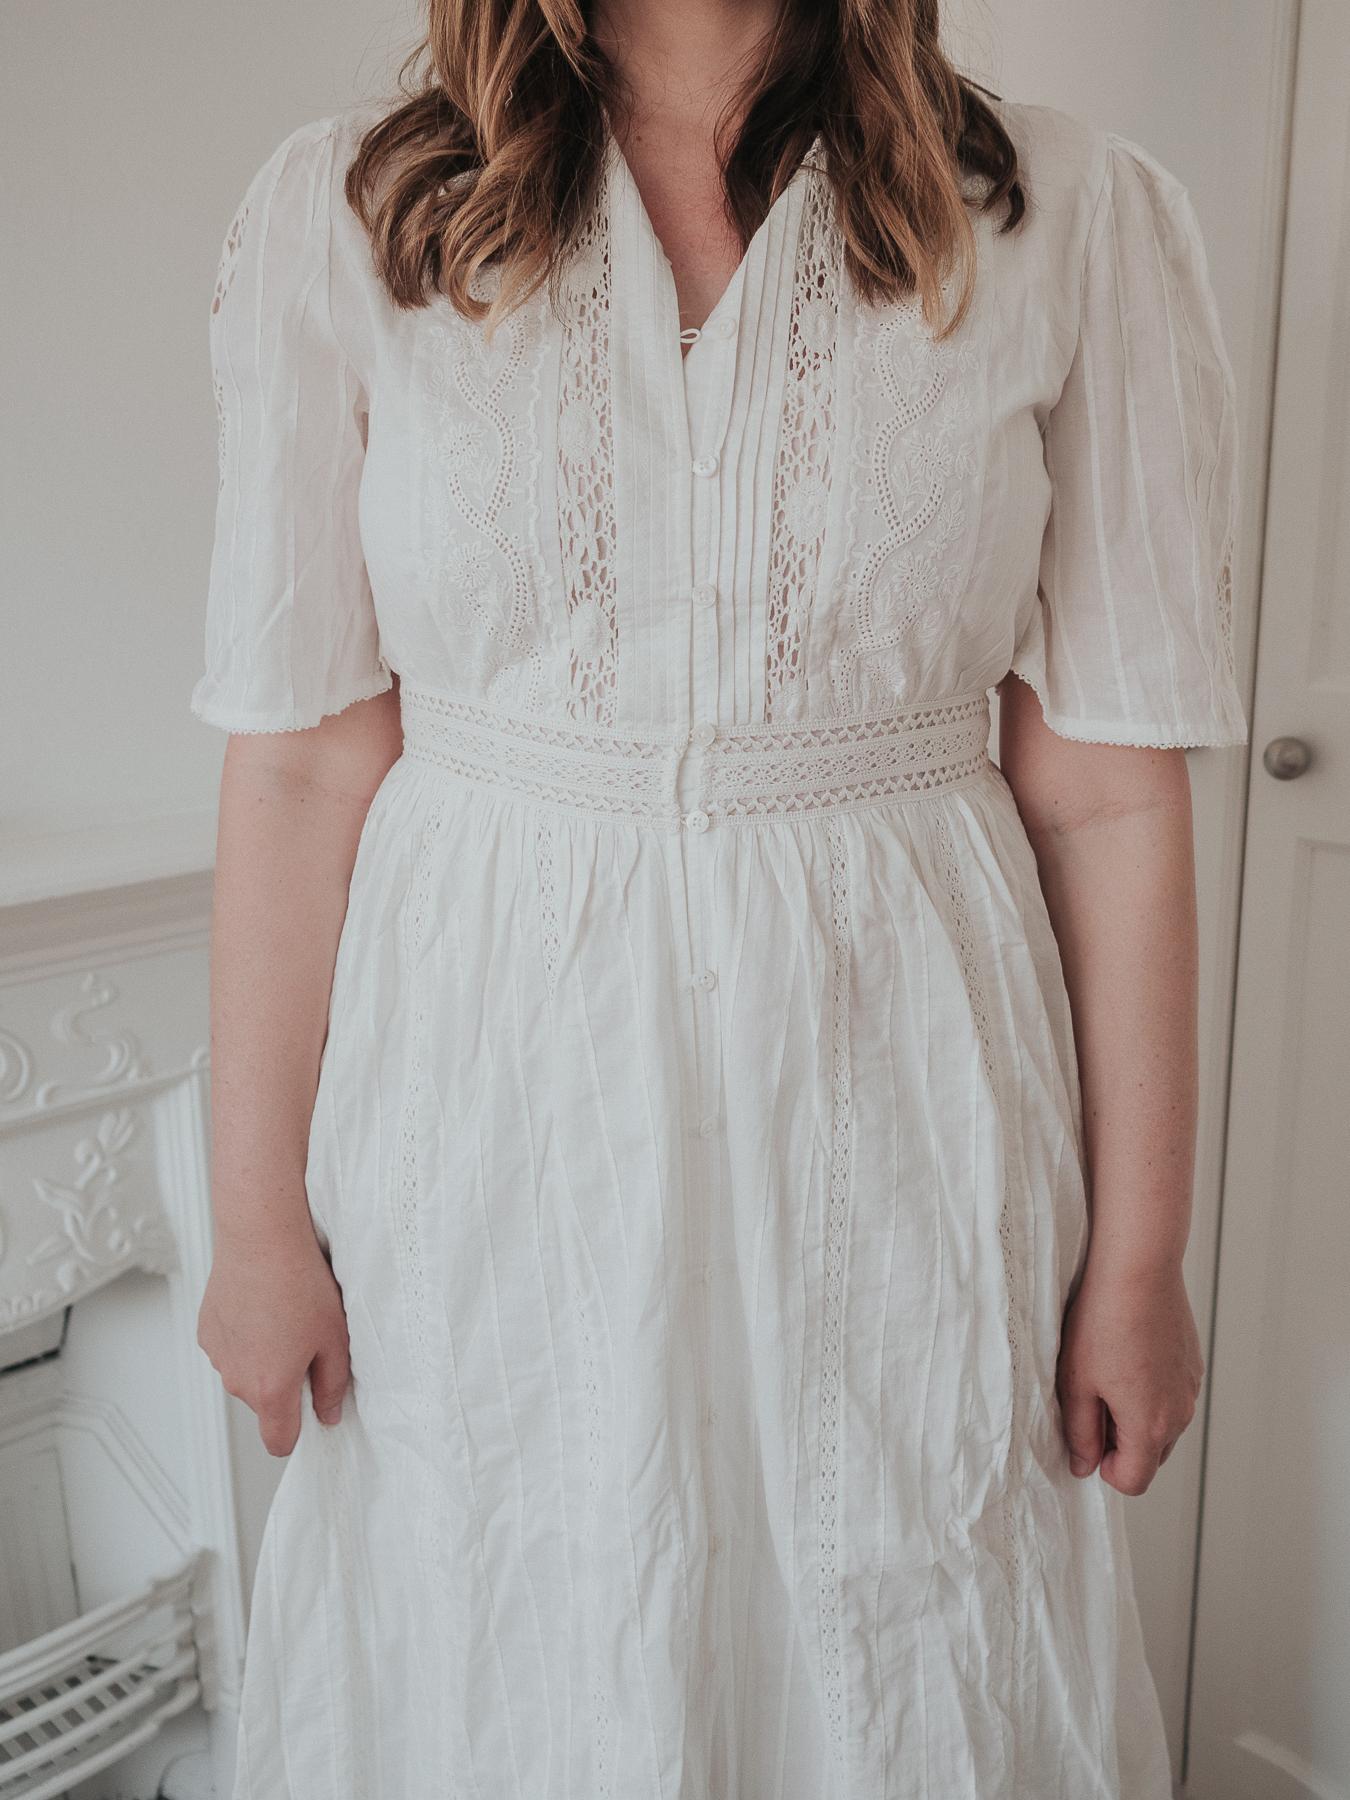 An honest review of Sezane | Maitena white maxi embroidered cotton dress | W&S